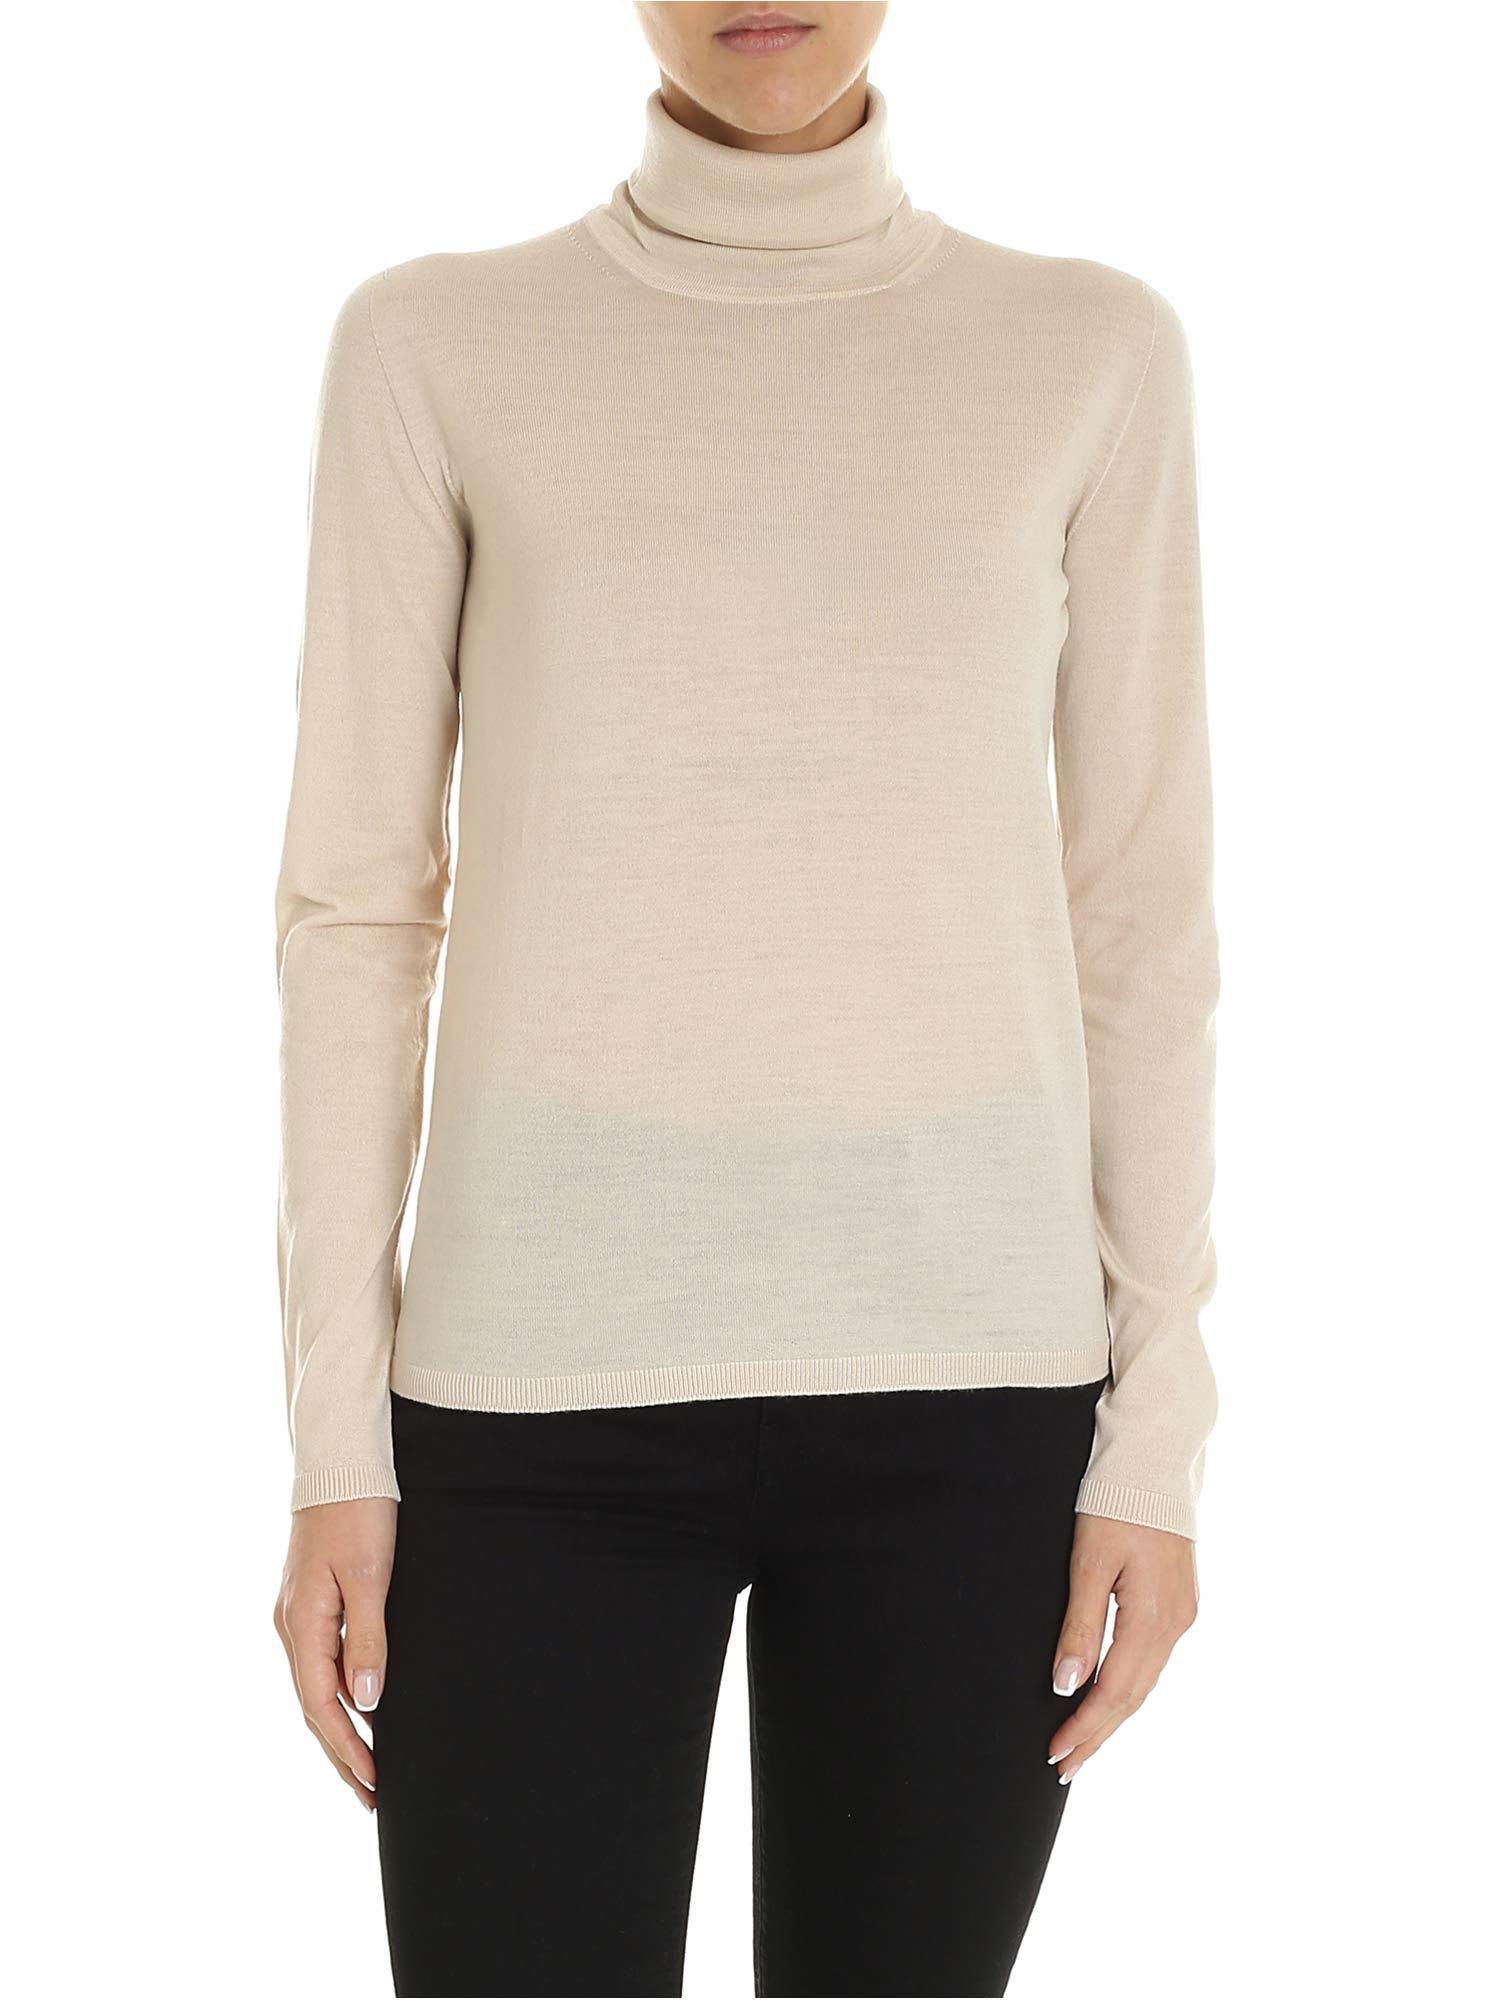 Max Mara - Anta Sweater